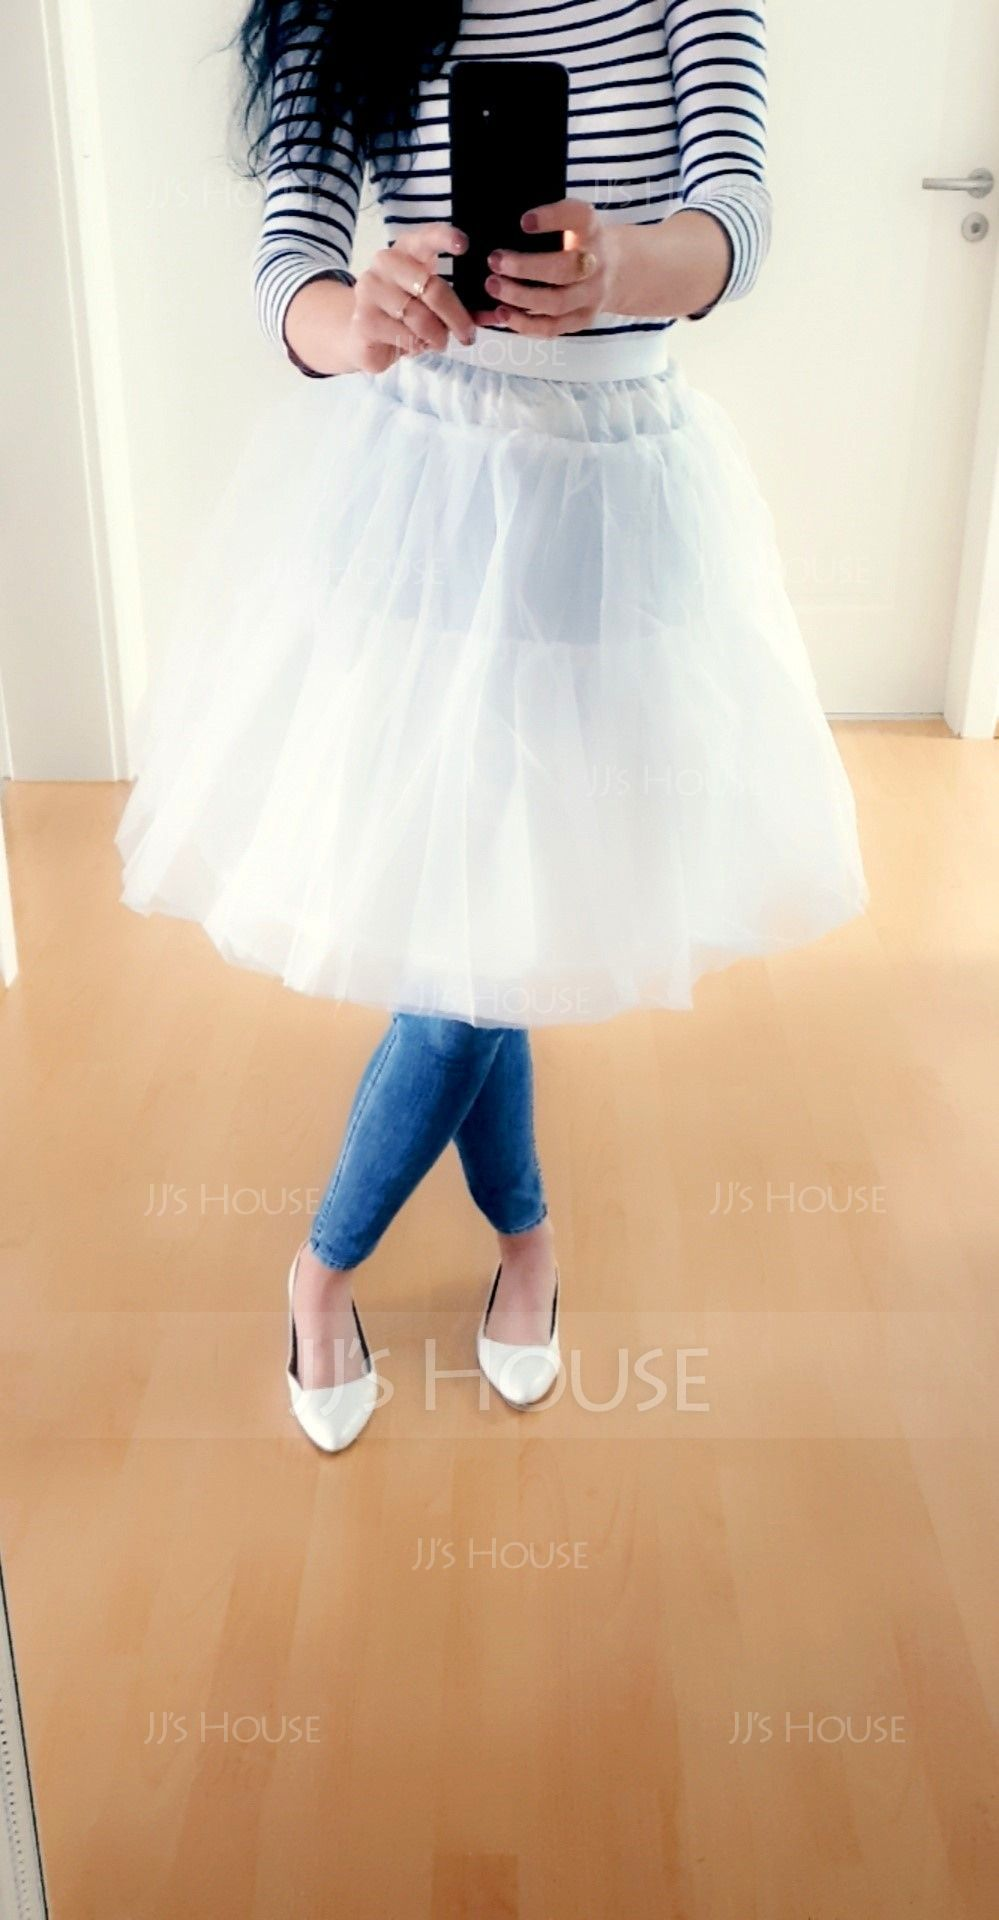 Girls Tulle Netting/Taffeta 3 Tiers Petticoats (037120310)